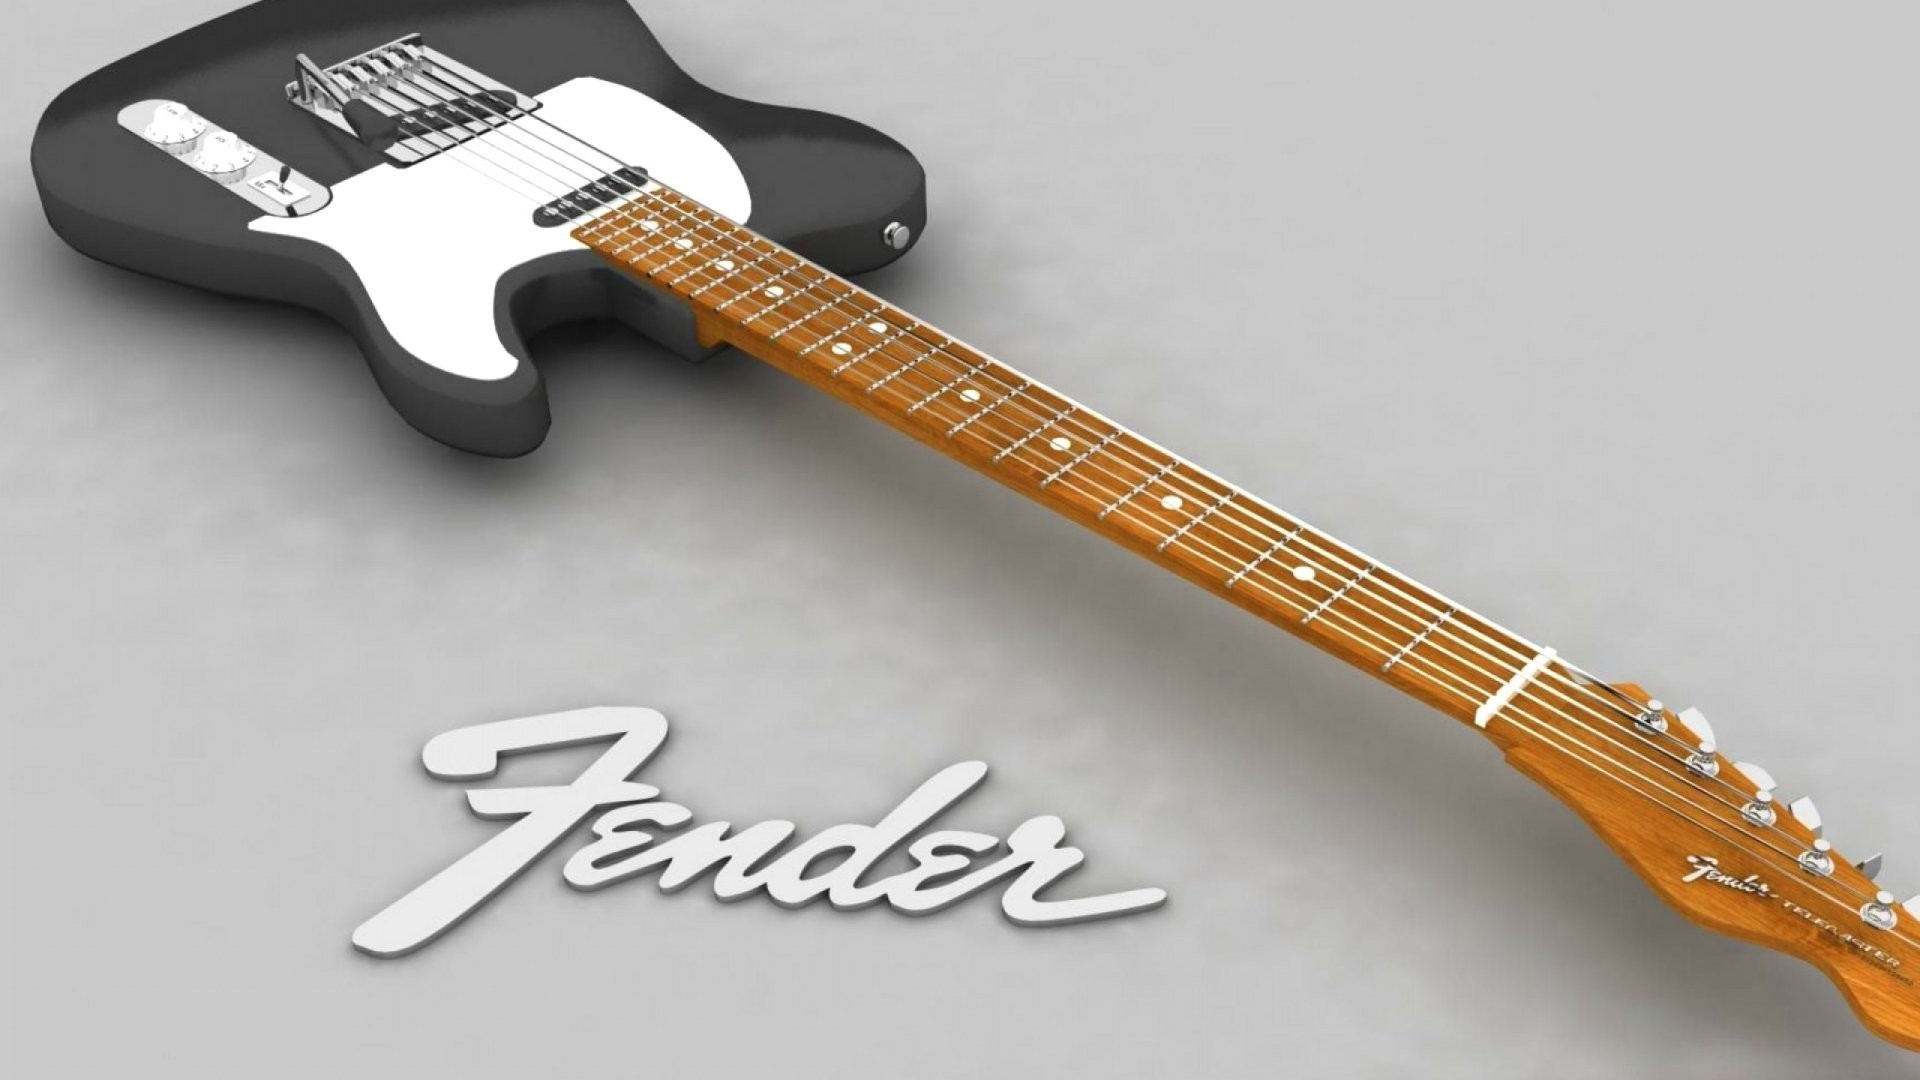 … free fender guitar wallpapers free long wallpapers …